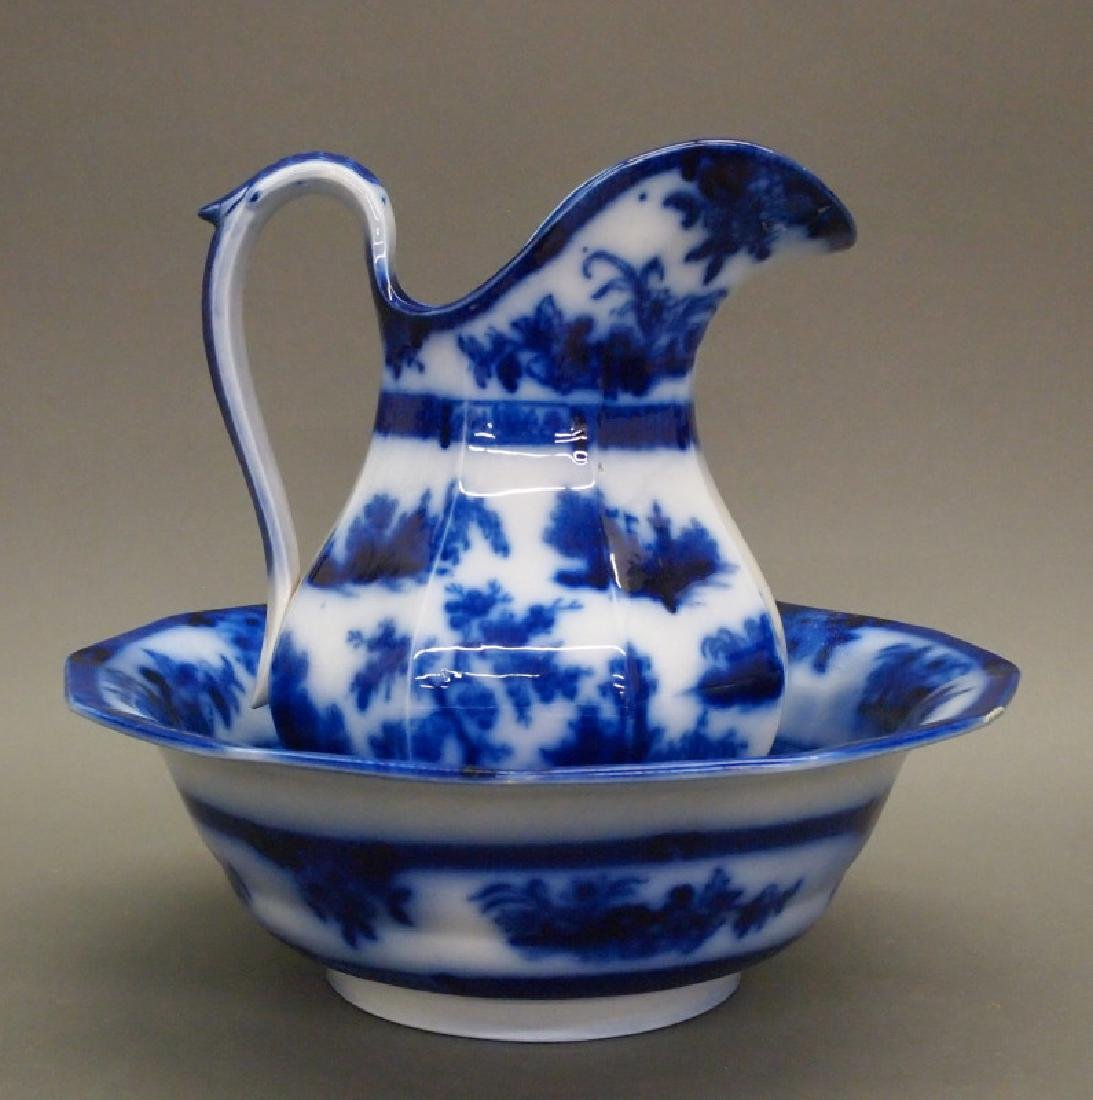 Wedgwood Chapoo bowl & pitcher